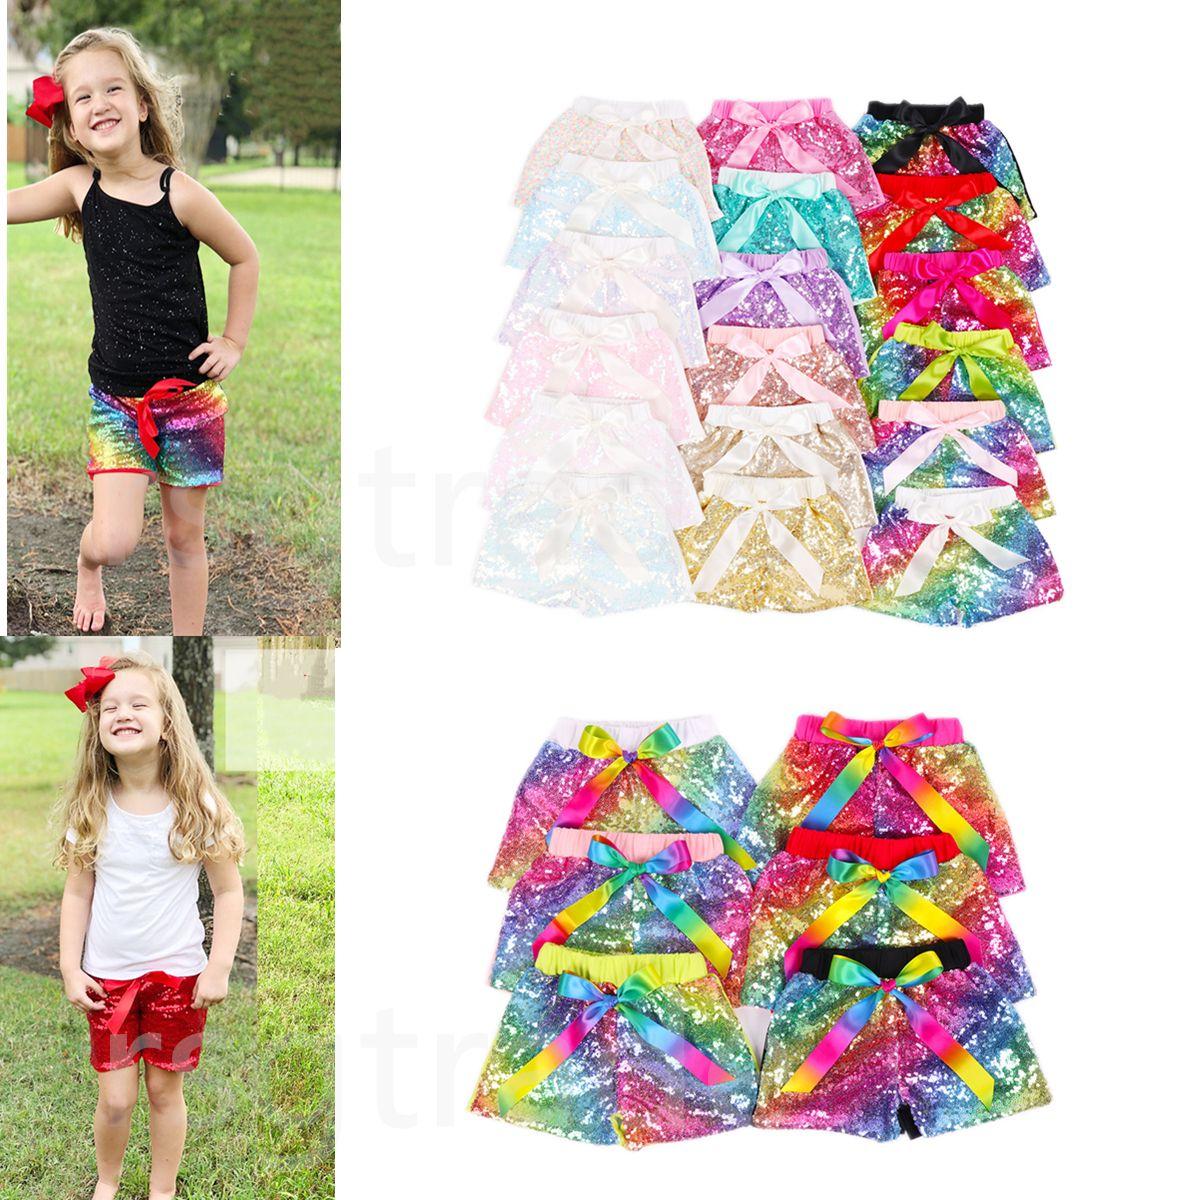 GRATIS DHL INS Toddler Baby Gold Sequins pantaloncini pantaloni per ragazze estive sattin bowknot party pantaloni corti bambini boutique bambini pantaloncini da ballo